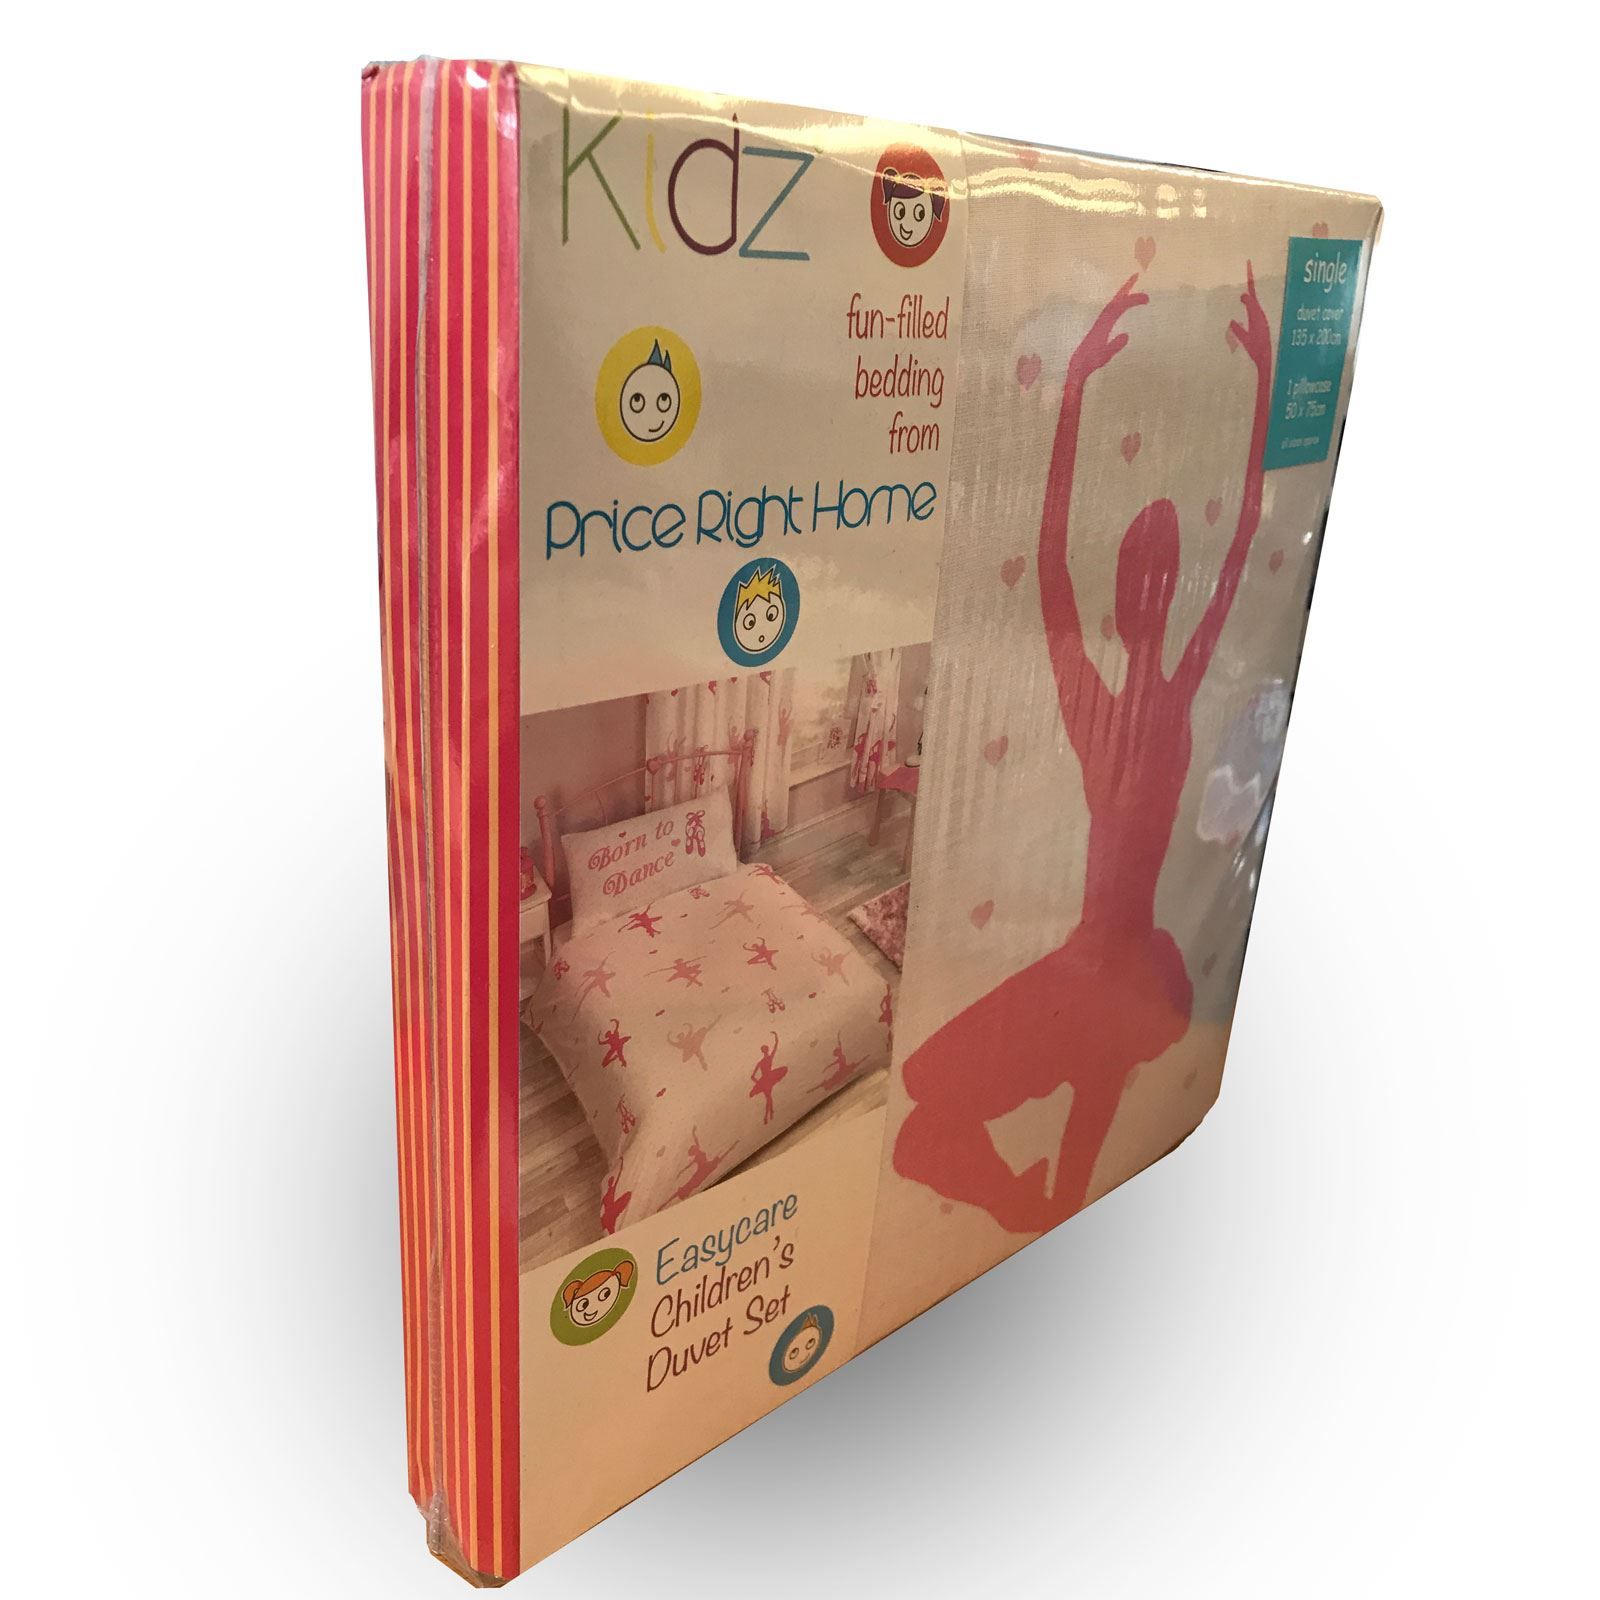 CHARACTER-AND-THEMED-SINGLE-DUVET-COVER-KIDS-BEDDING-SETS-AVENGERS-KITTY-UNICORN thumbnail 14